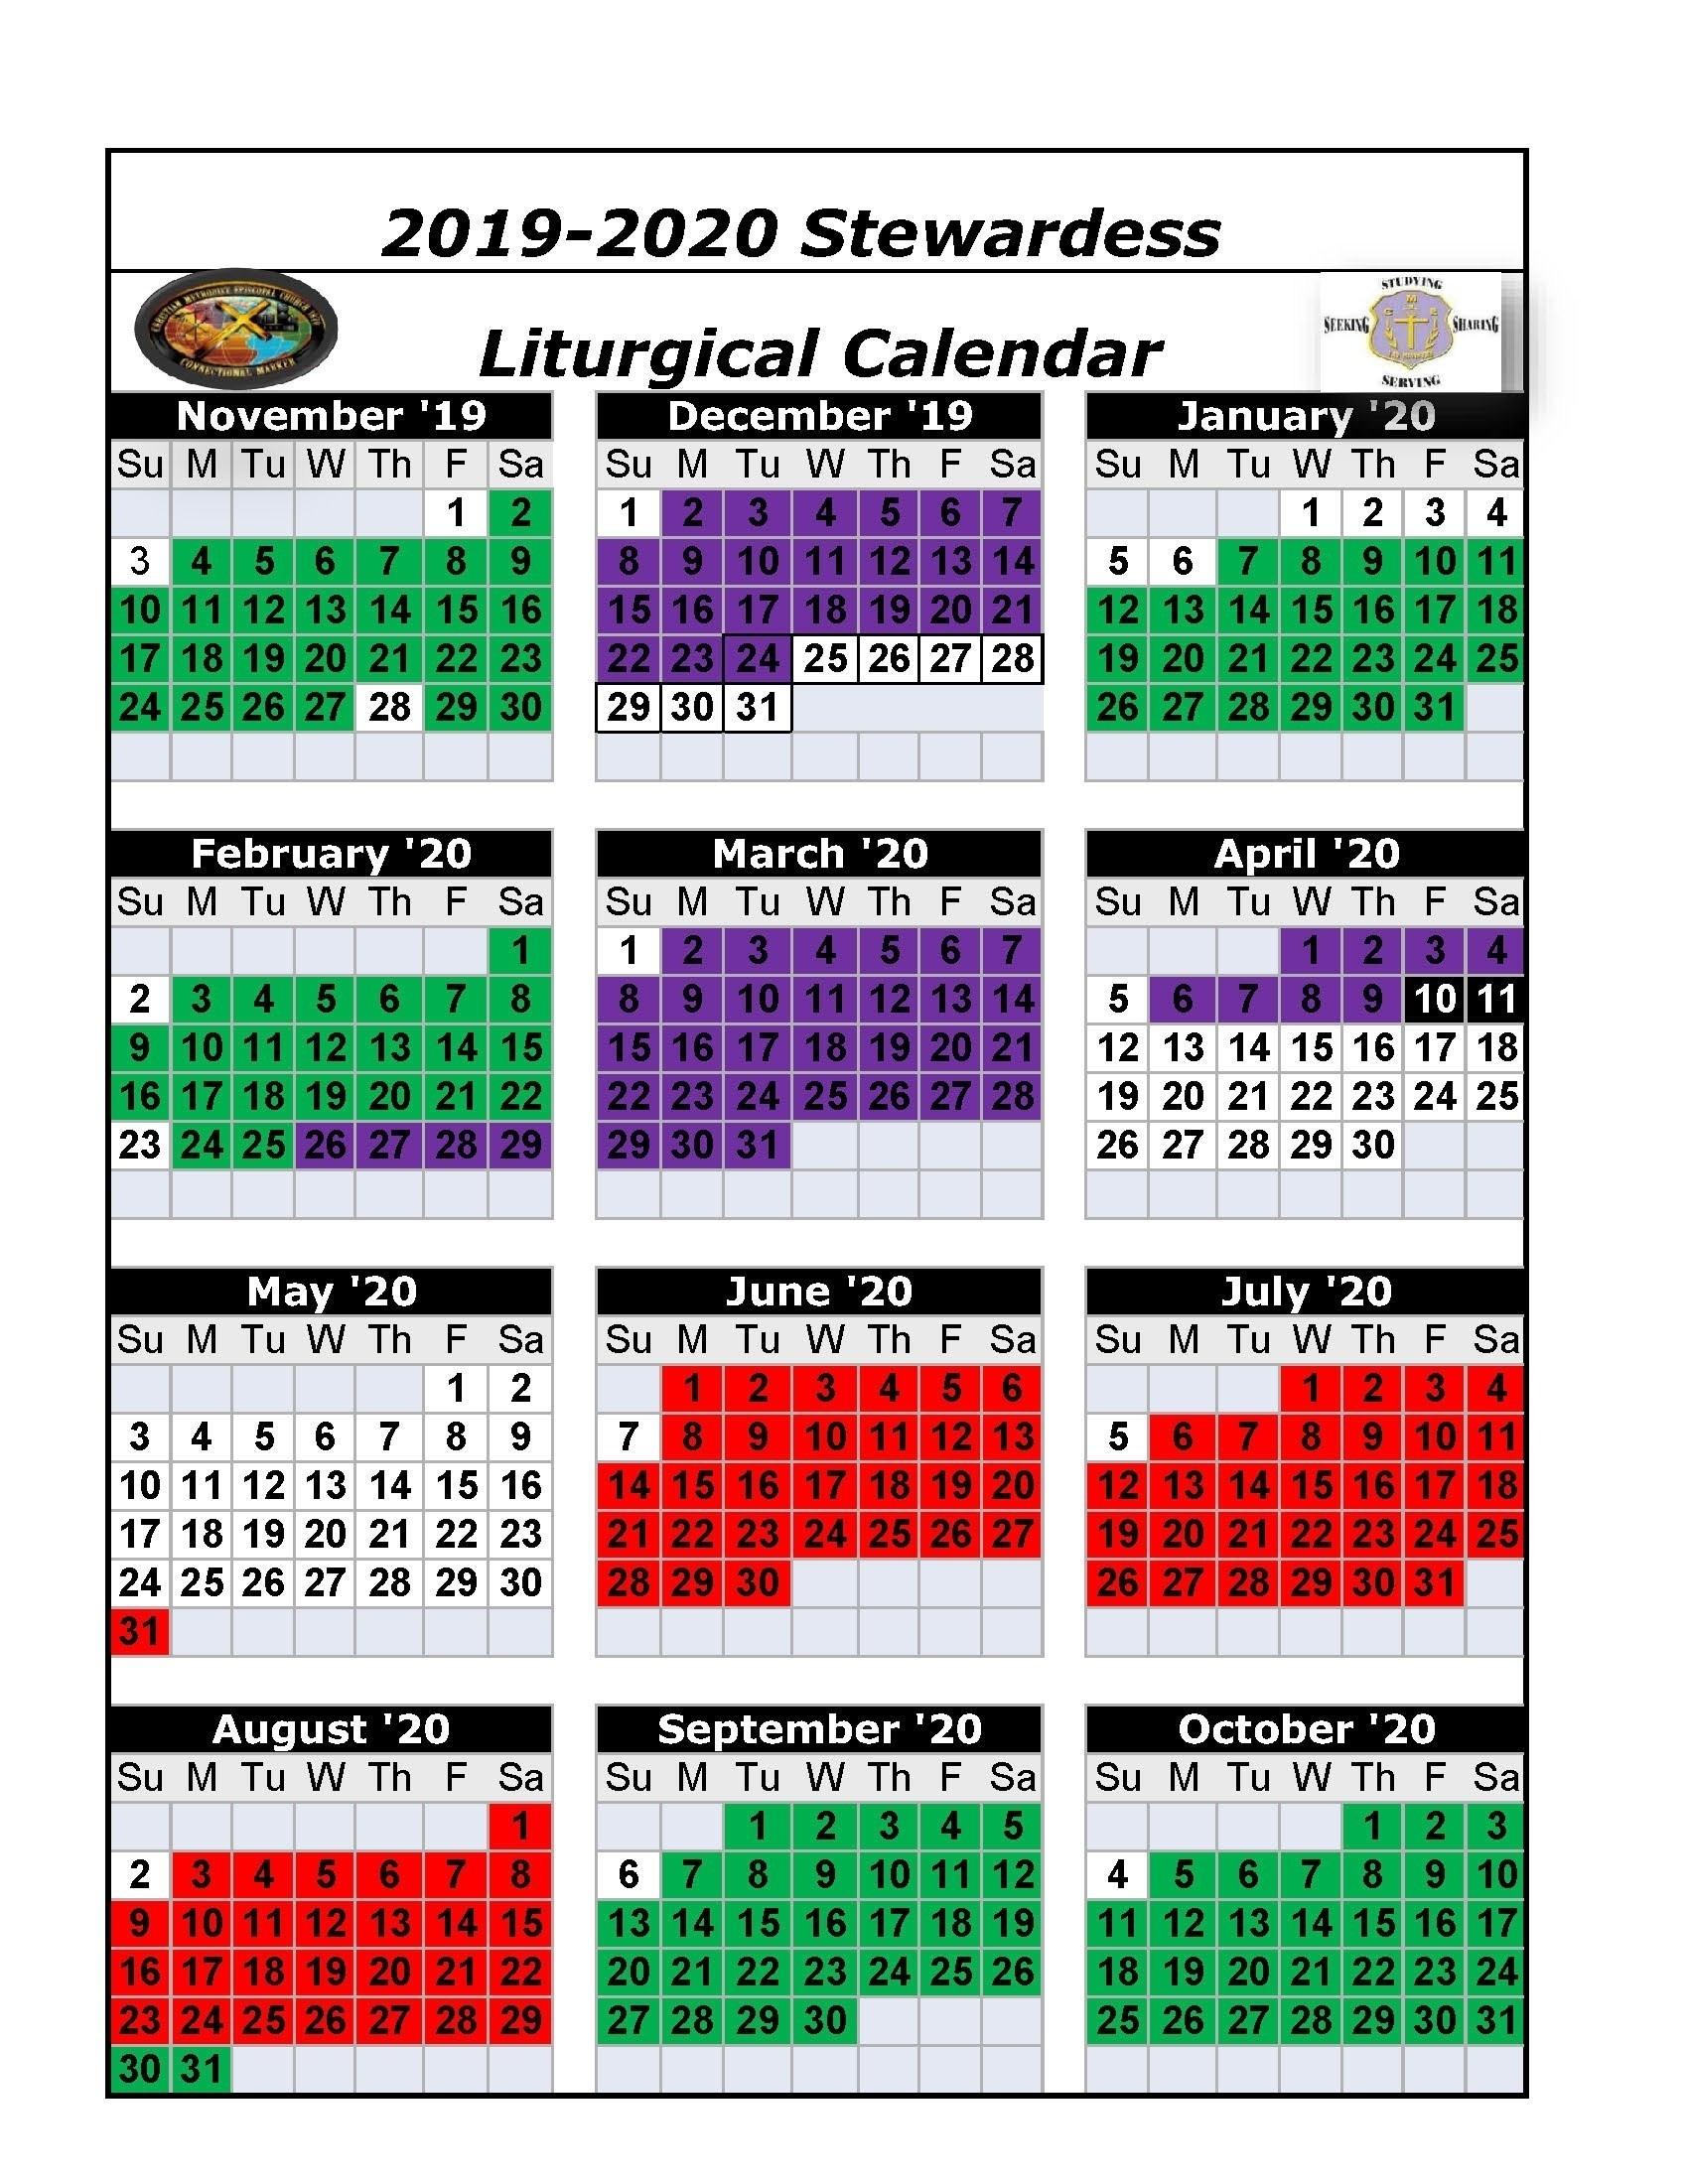 Liturgical Year Worksheet | Printable Worksheets And  Methodist Church Liturgical Calendar 2021